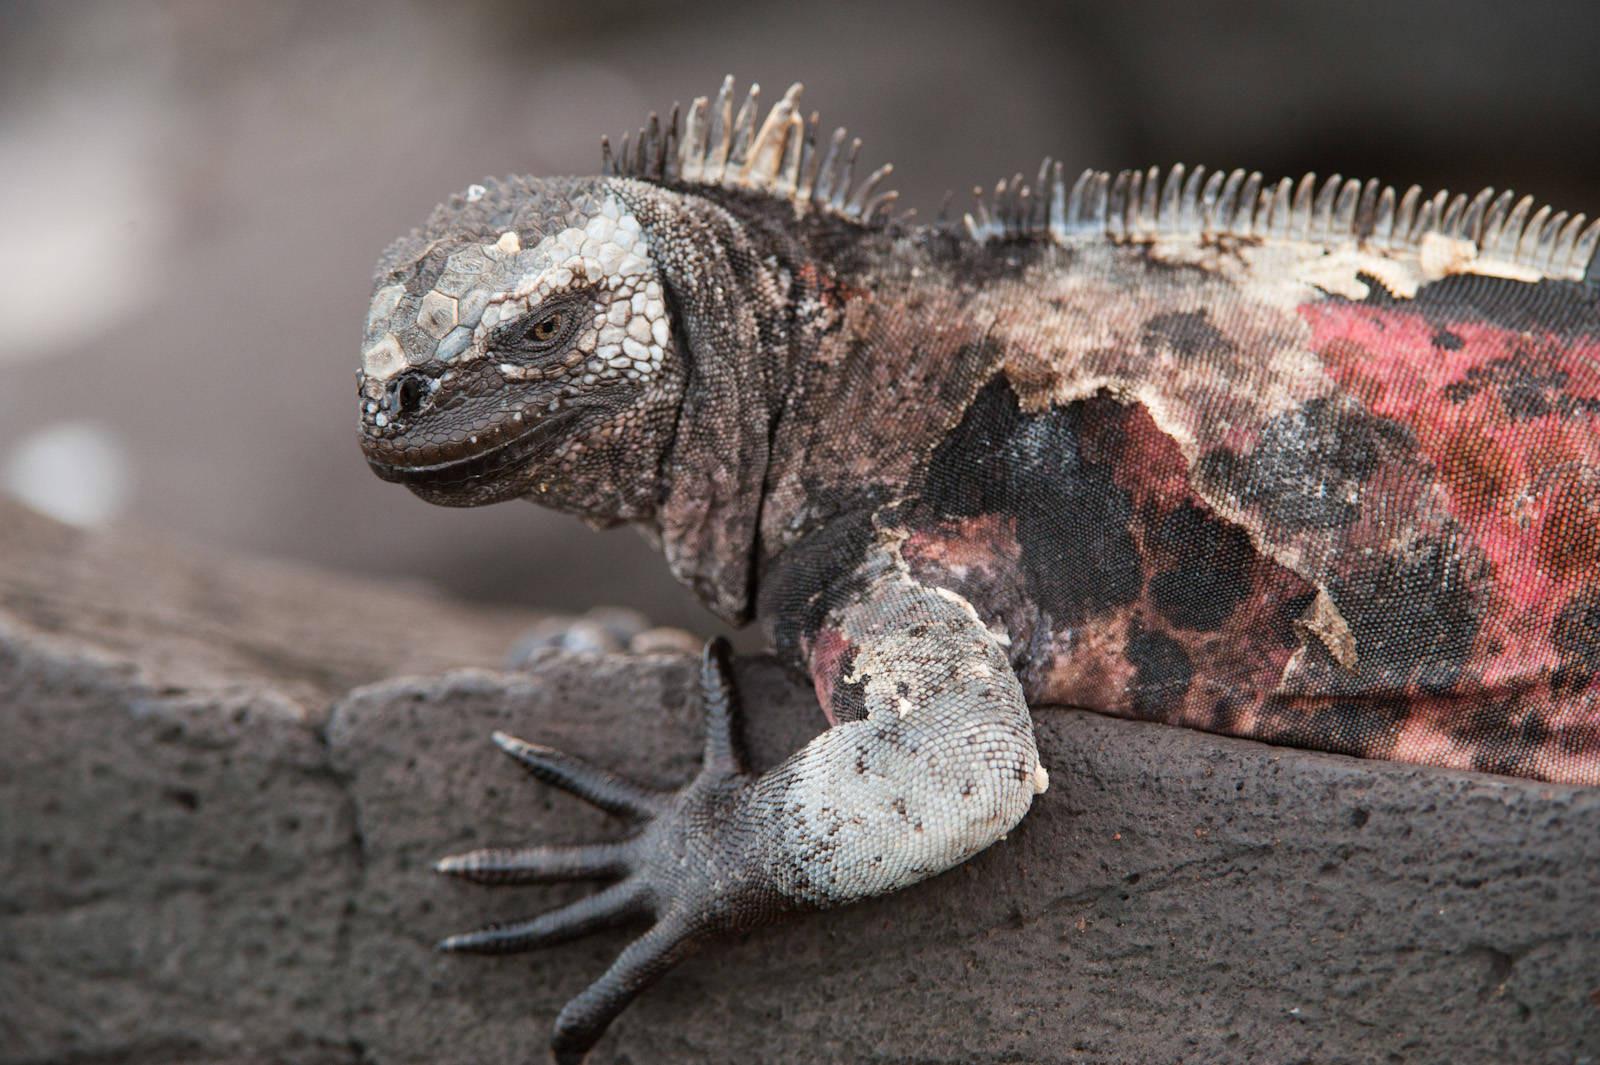 Photo: A marine iguana (Amblyrhynchus cristatus) on Espanola Island in Galapagos National Park.